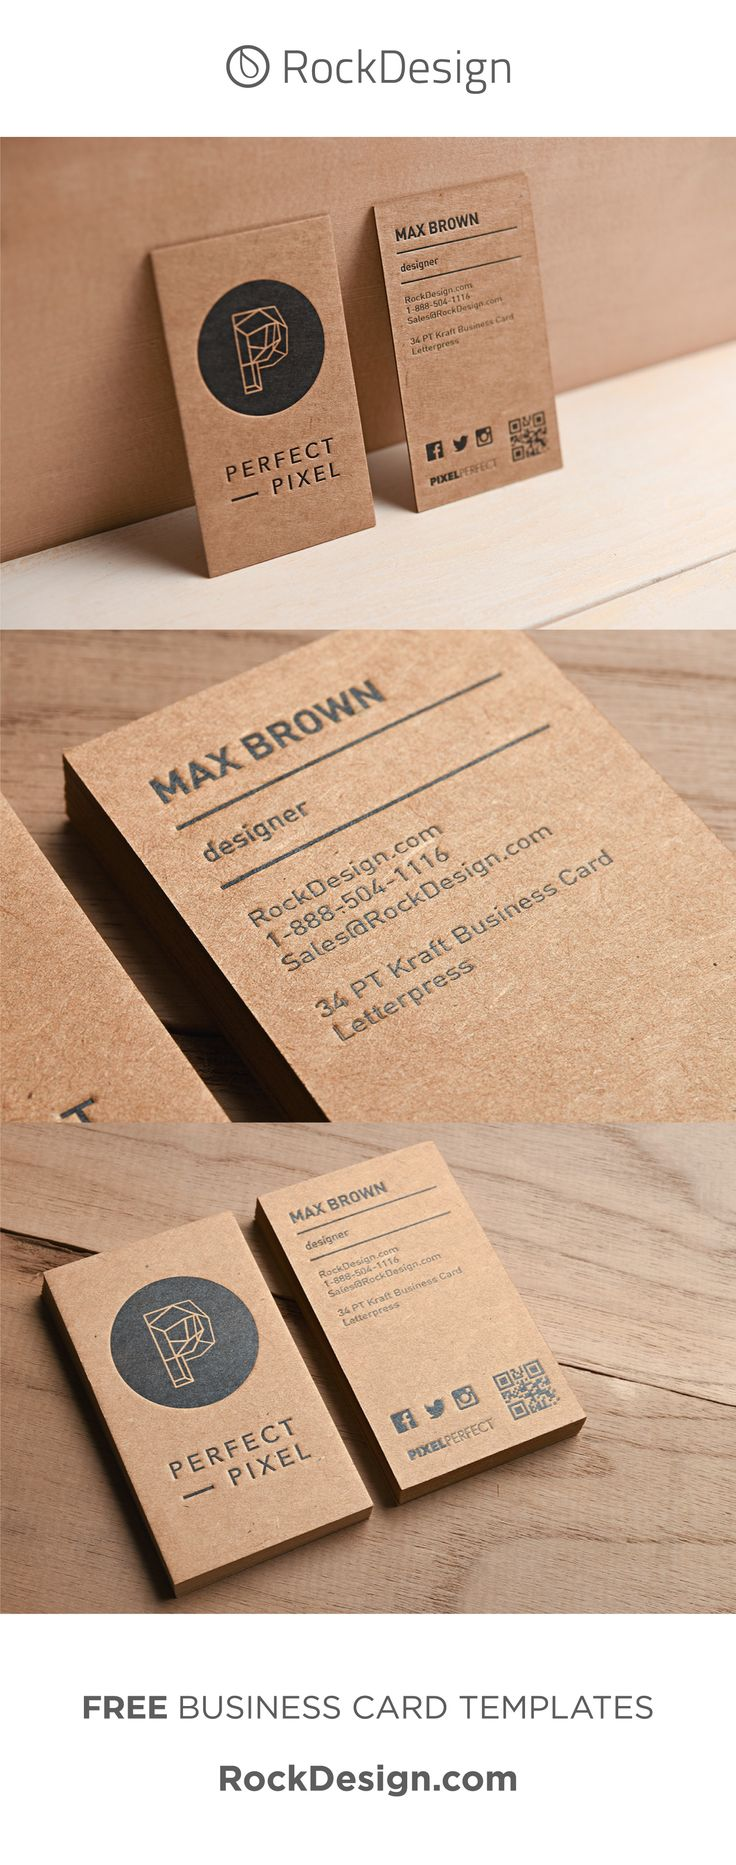 MODERN STYLISH LETTERPRESS KRAFT BUSINESS CARD – PERFECT PIXEL